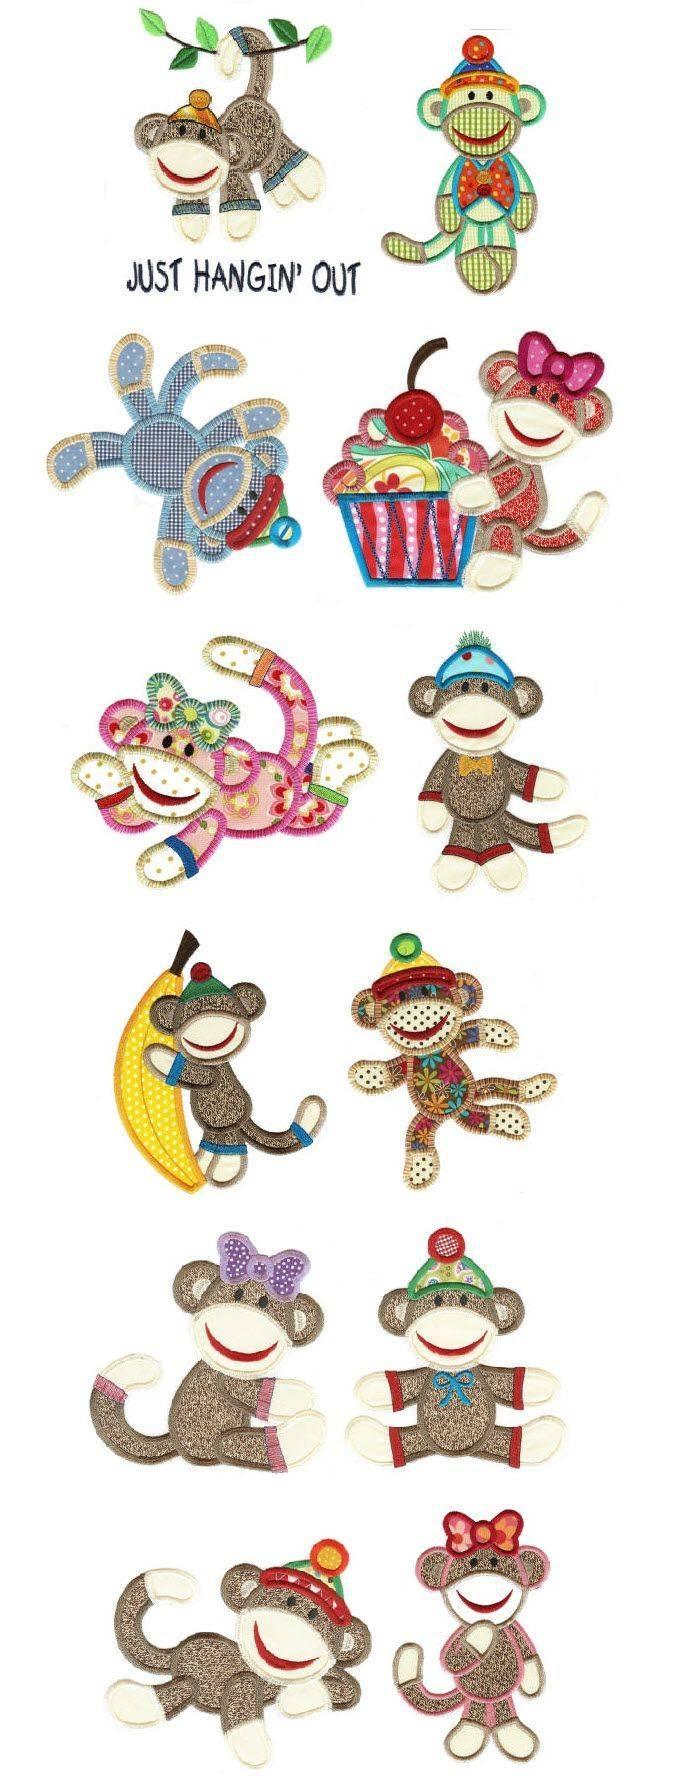 28 Best Sock Monkey Design Sets Images On Pinterest | Sock Monkeys Within Latest Sock Monkey Wall Art (View 13 of 30)